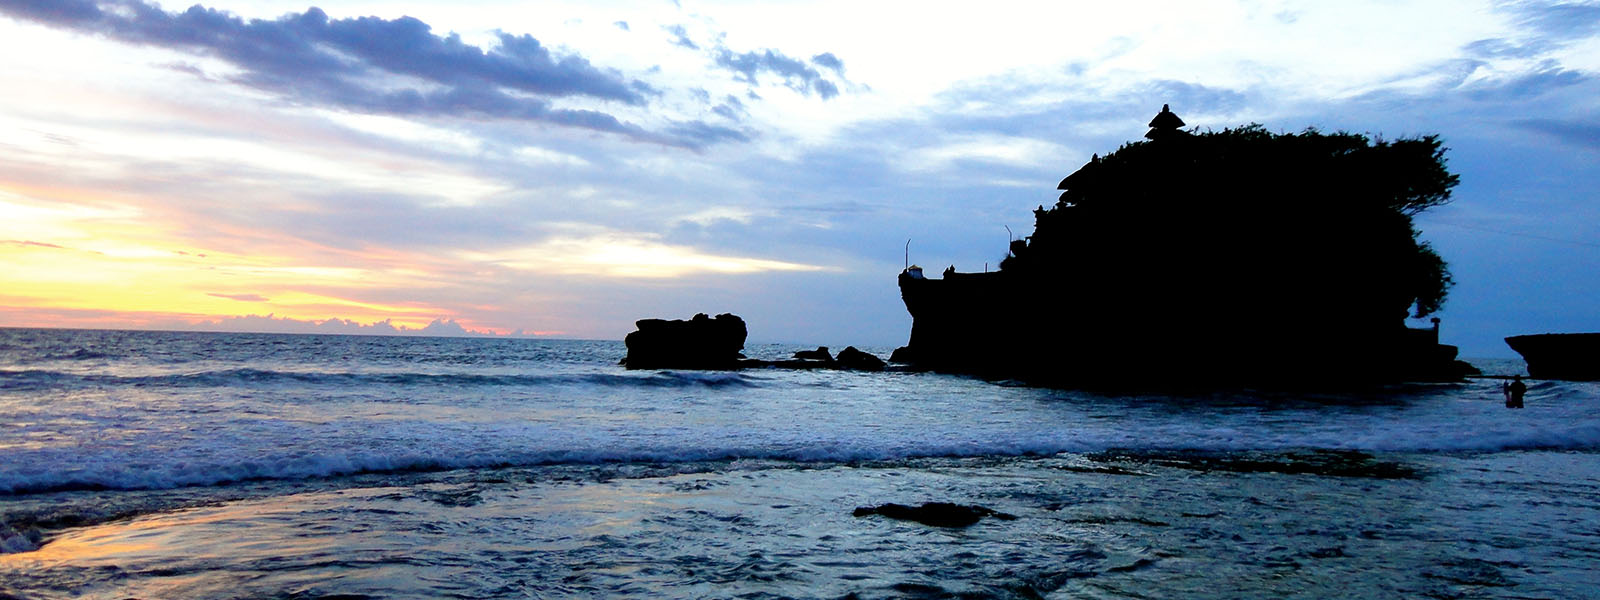 Groepsreis Bali - Tanah Lot